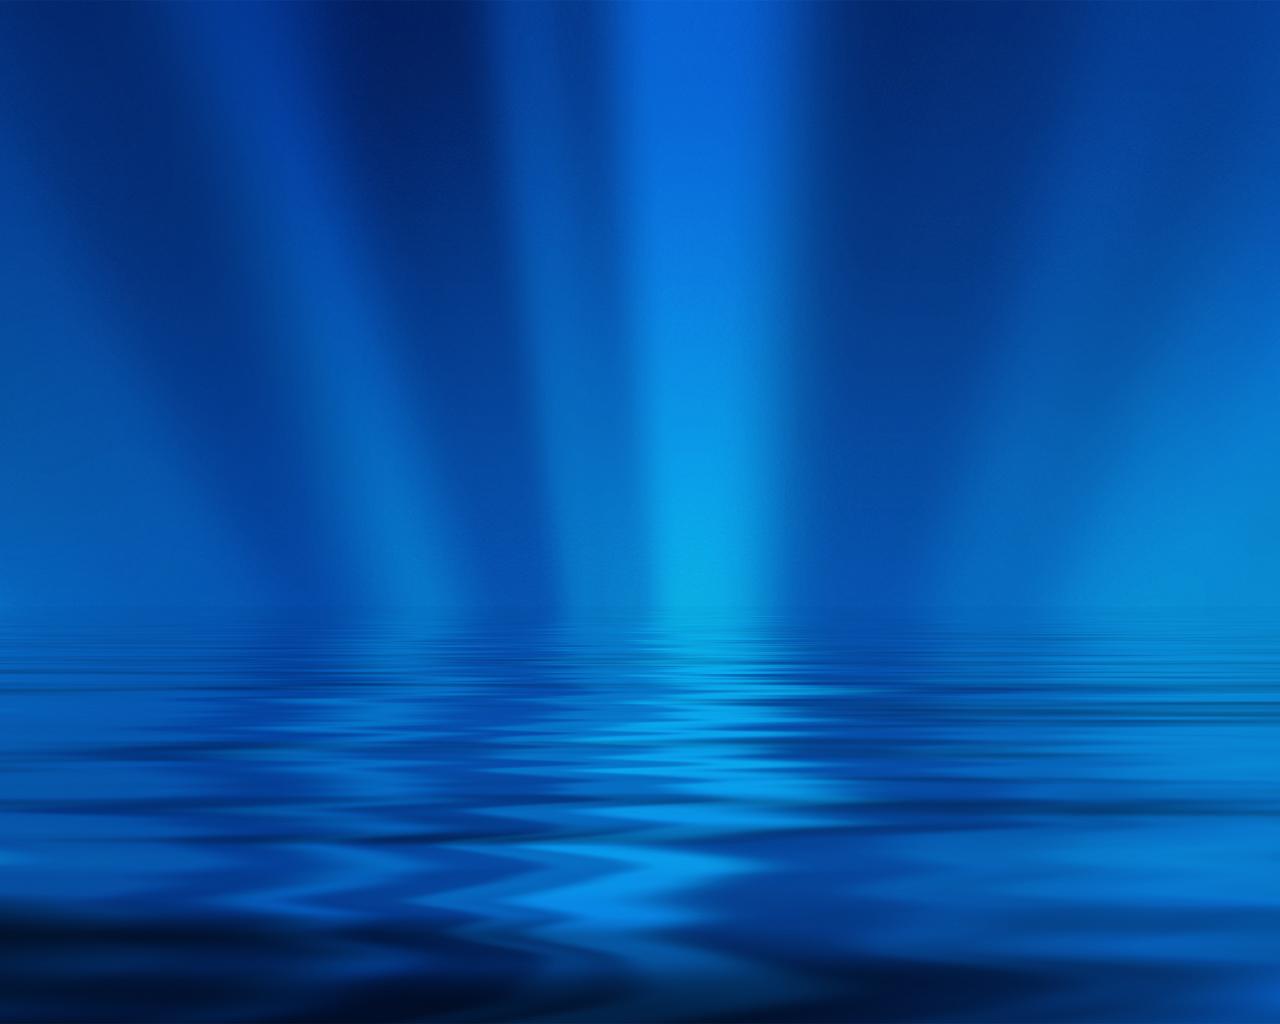 Blue Color Desktop Wallpapers Art And Entertainment Blog